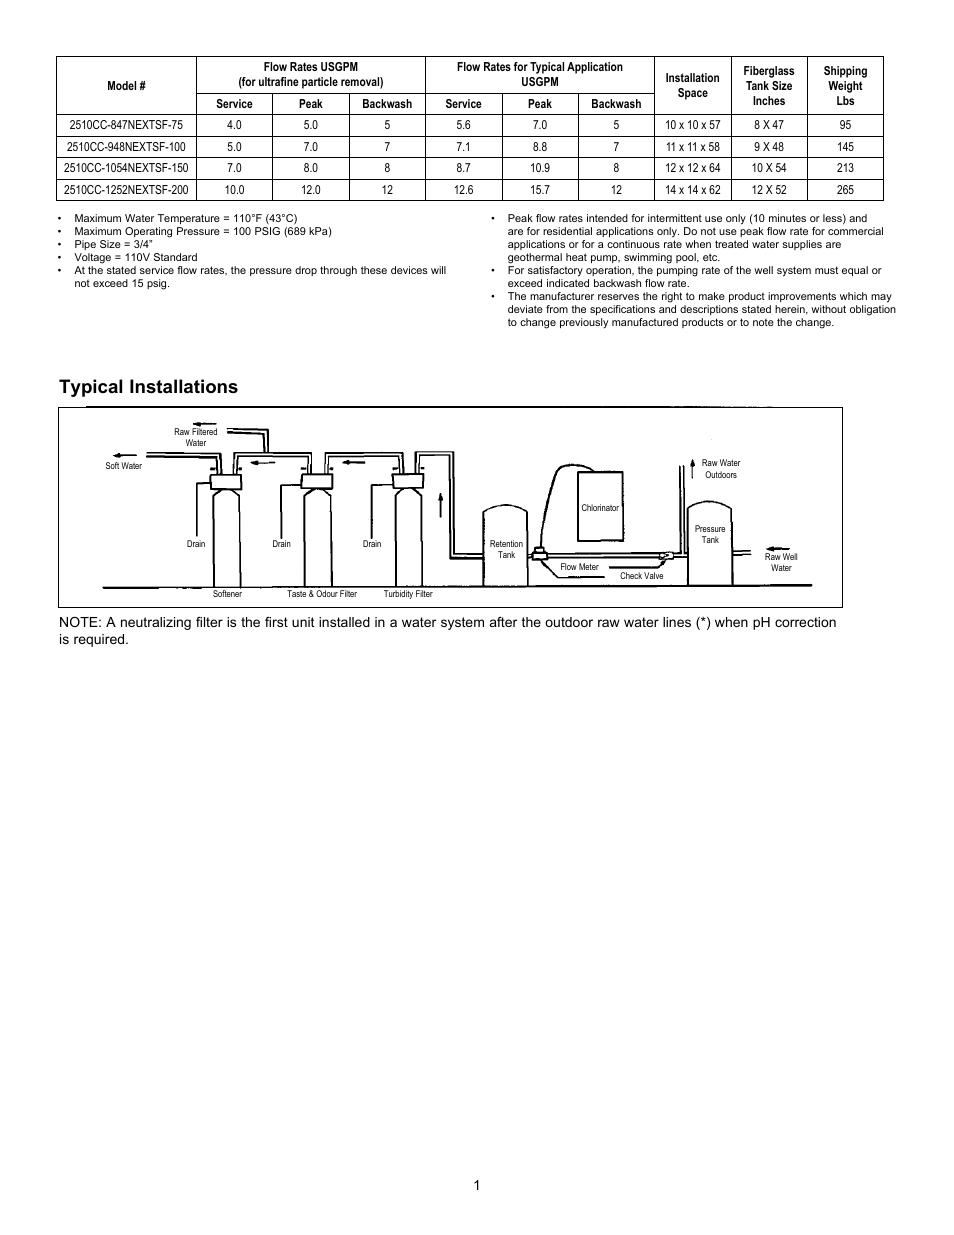 Typical installations   Hydrotech 2510 Valve nextSand